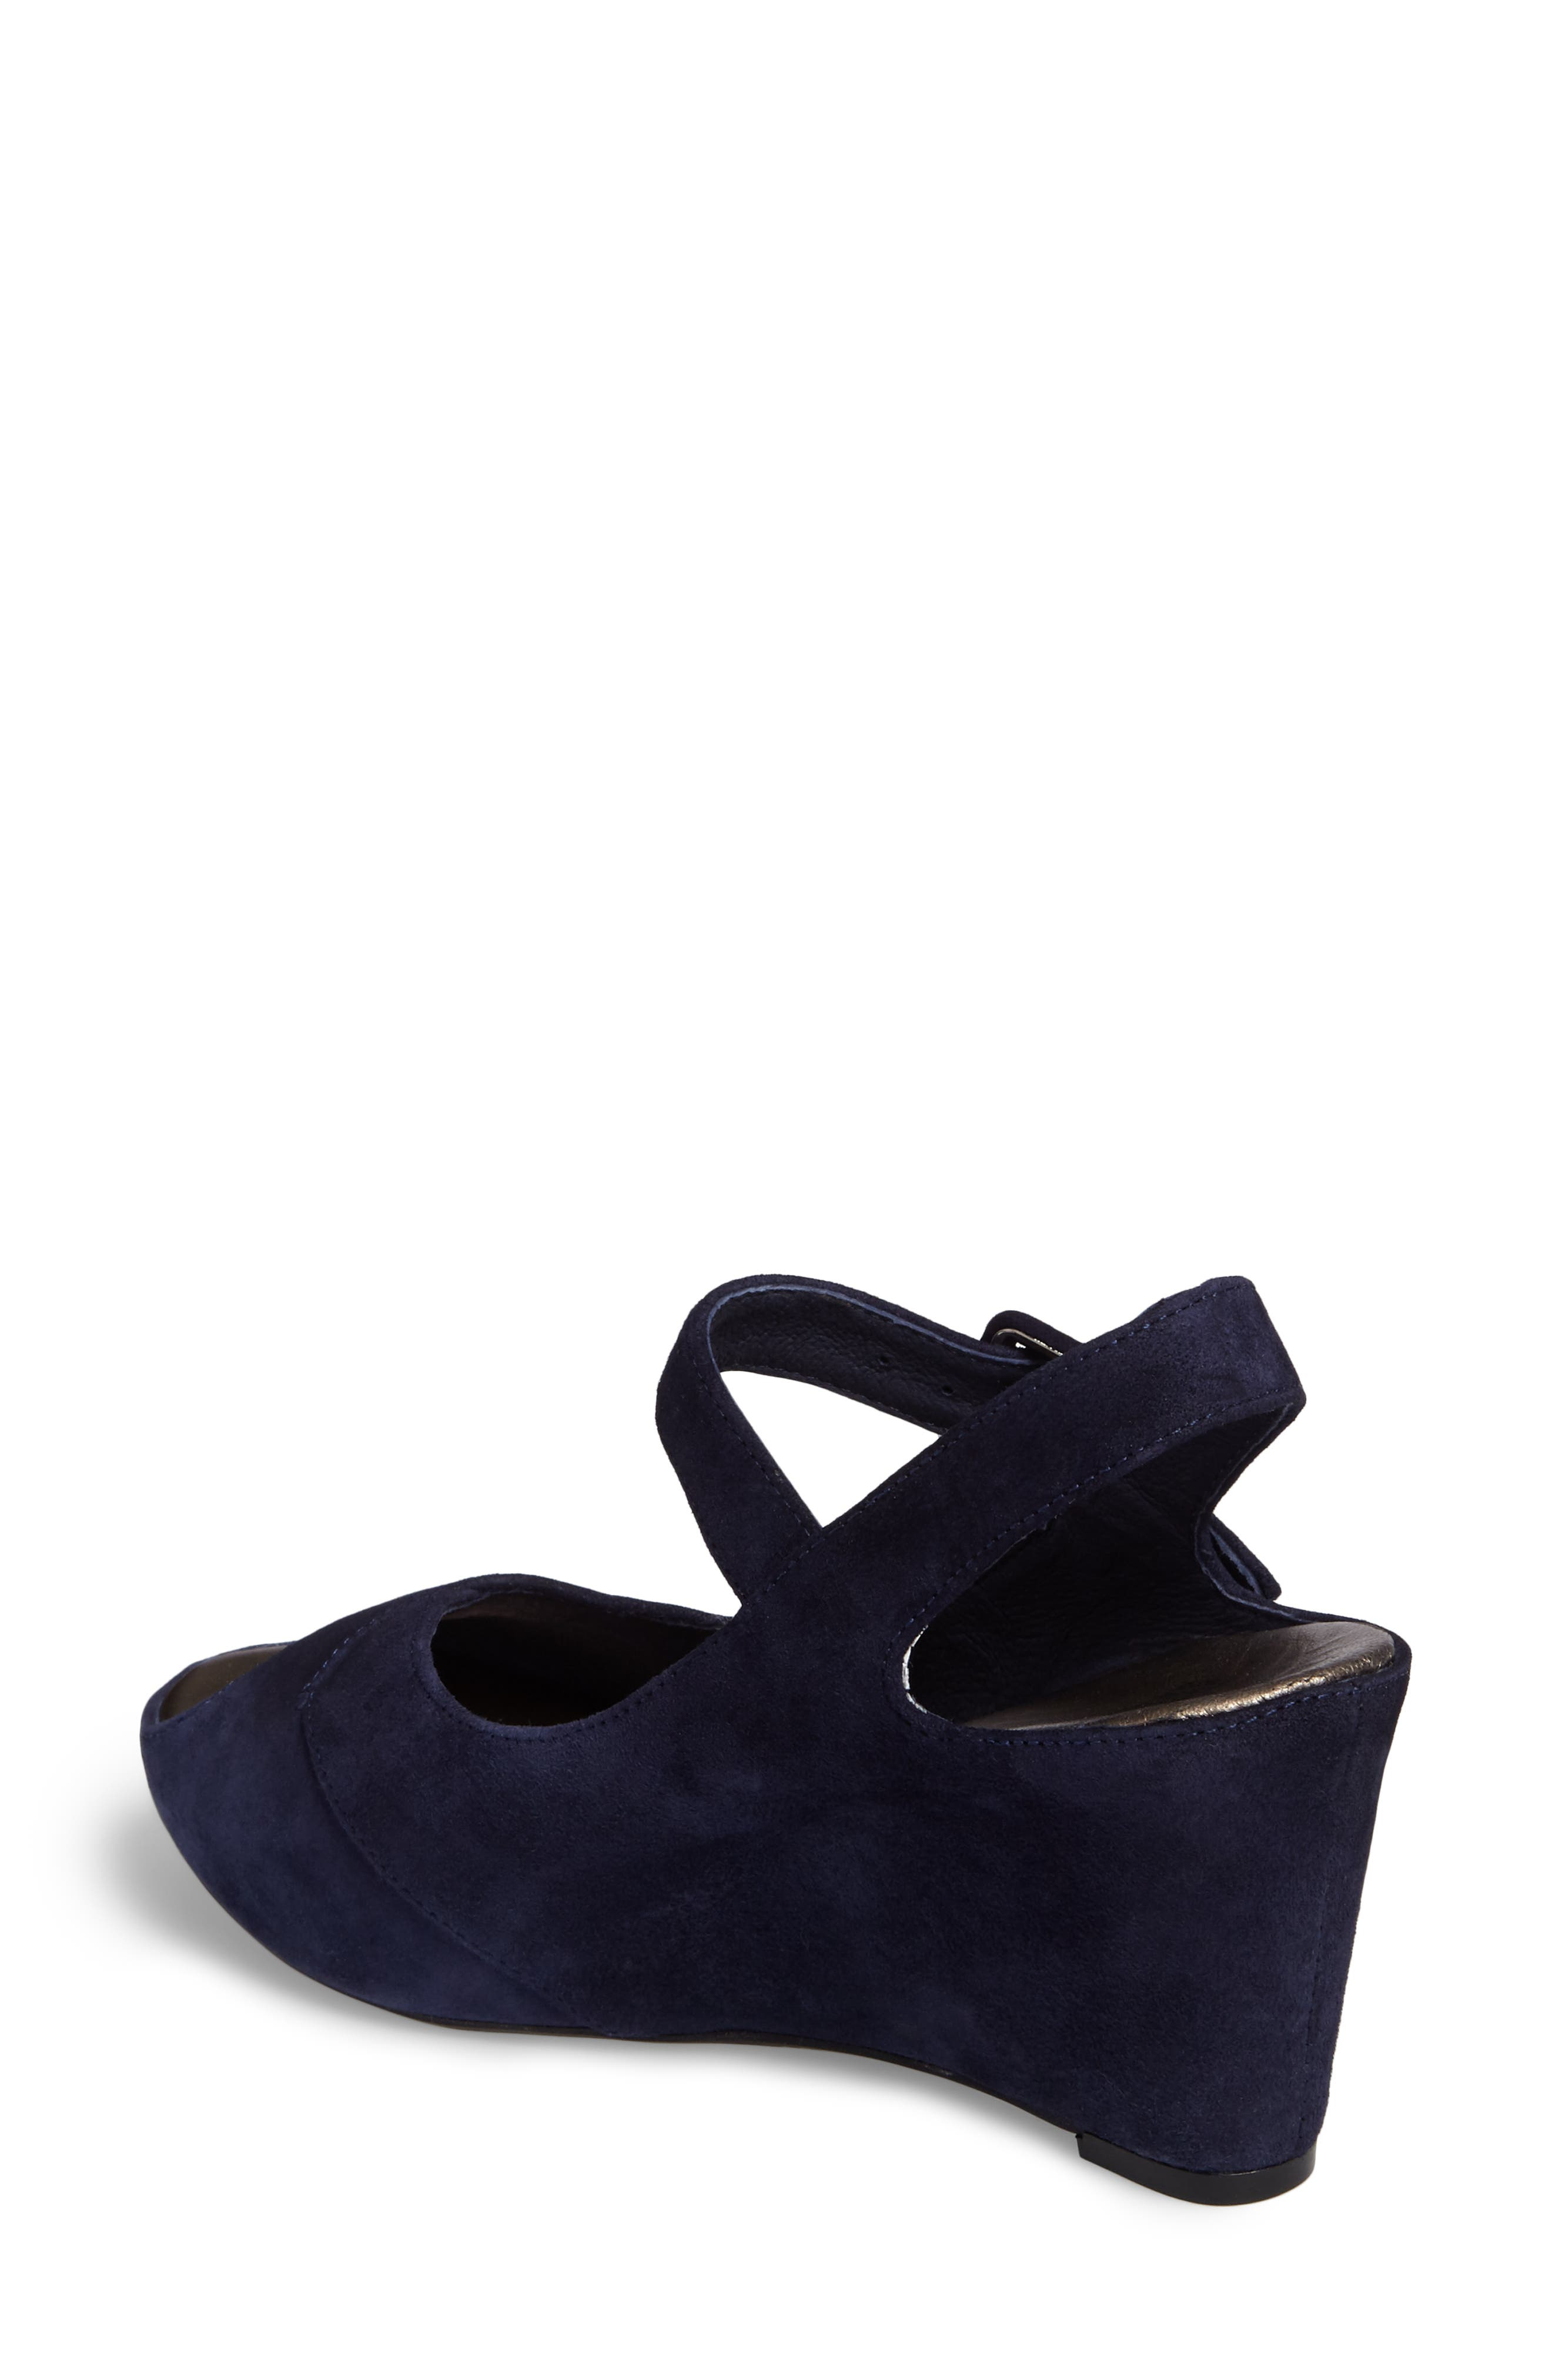 Tara Platform Wedge Sandal,                             Alternate thumbnail 2, color,                             NAVY SUEDE